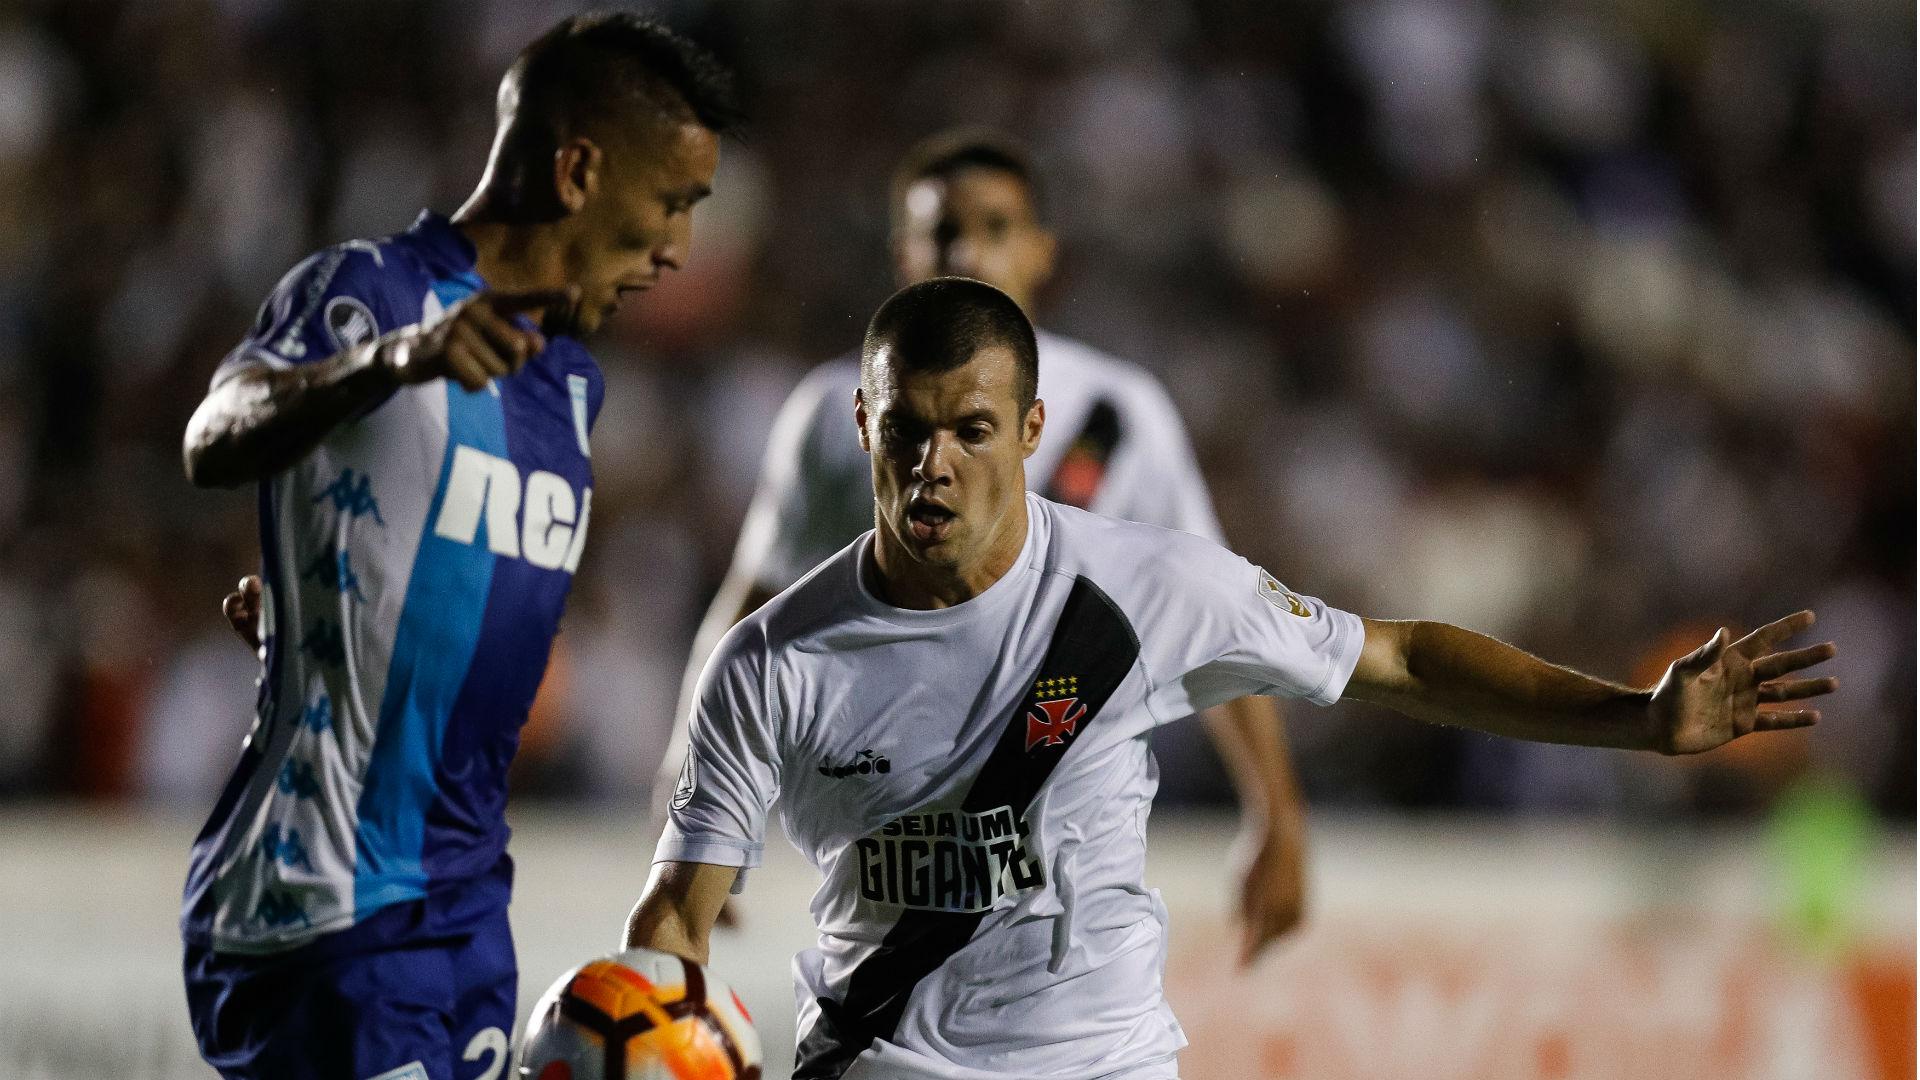 Wagner Vasco Racing Libertadores 26 04 2018